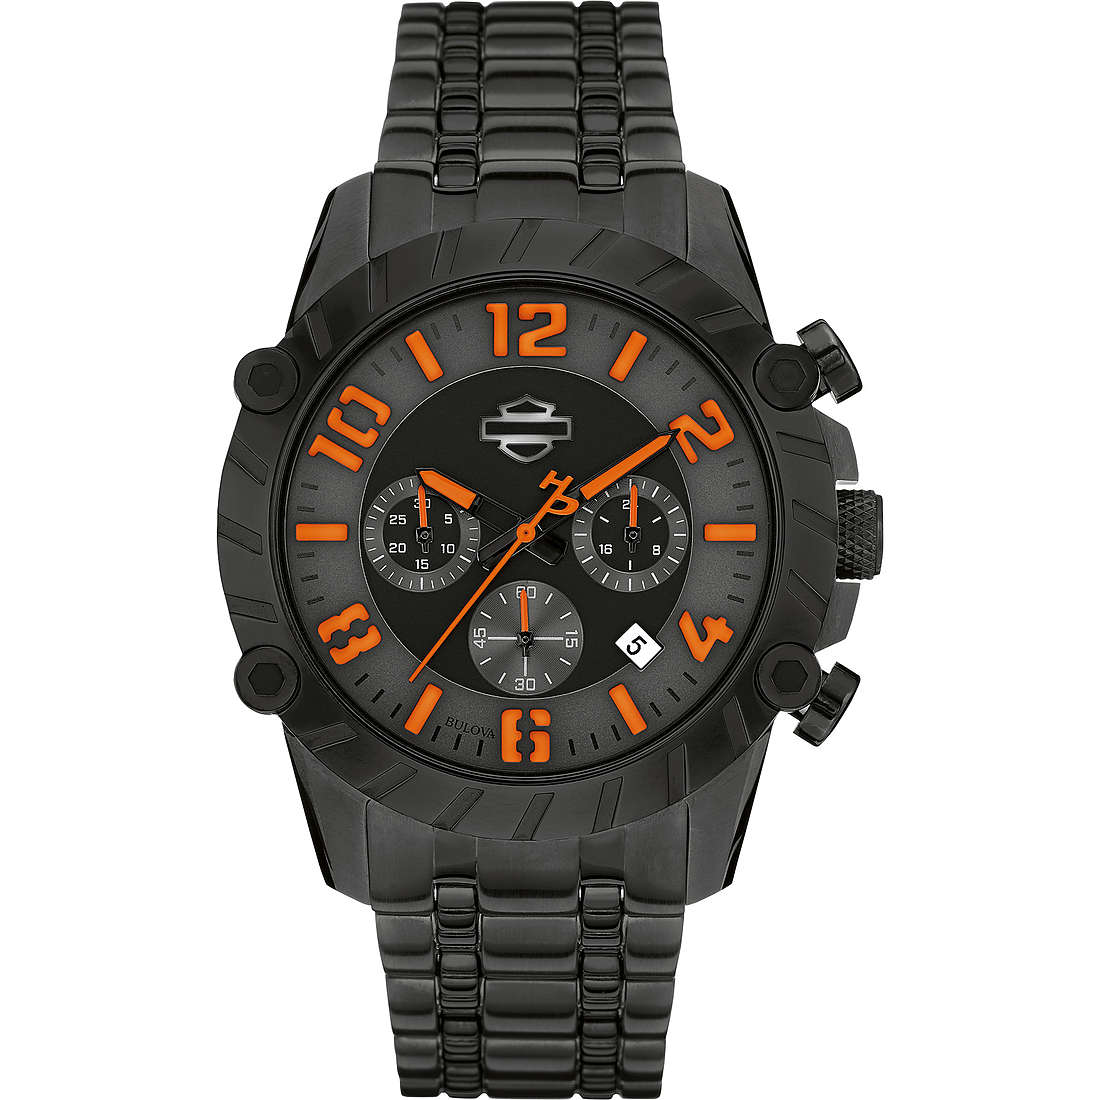 watch chronograph man Harley Davidson 78B137